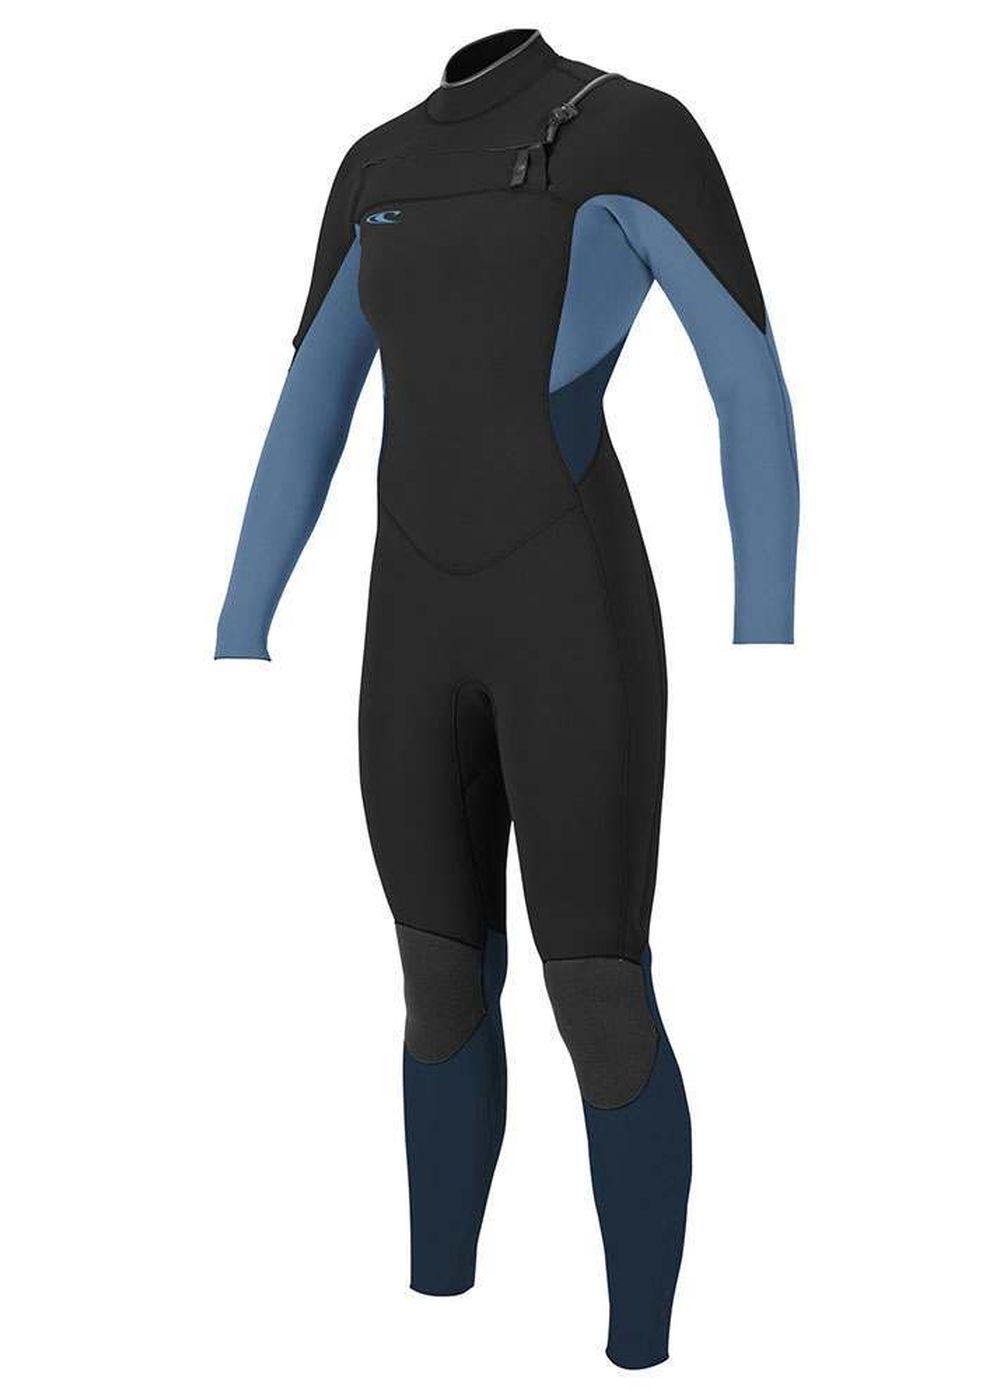 Oneill Womens Supertech Fz 5/4 Wetsuit 18 Blk/dst Picture